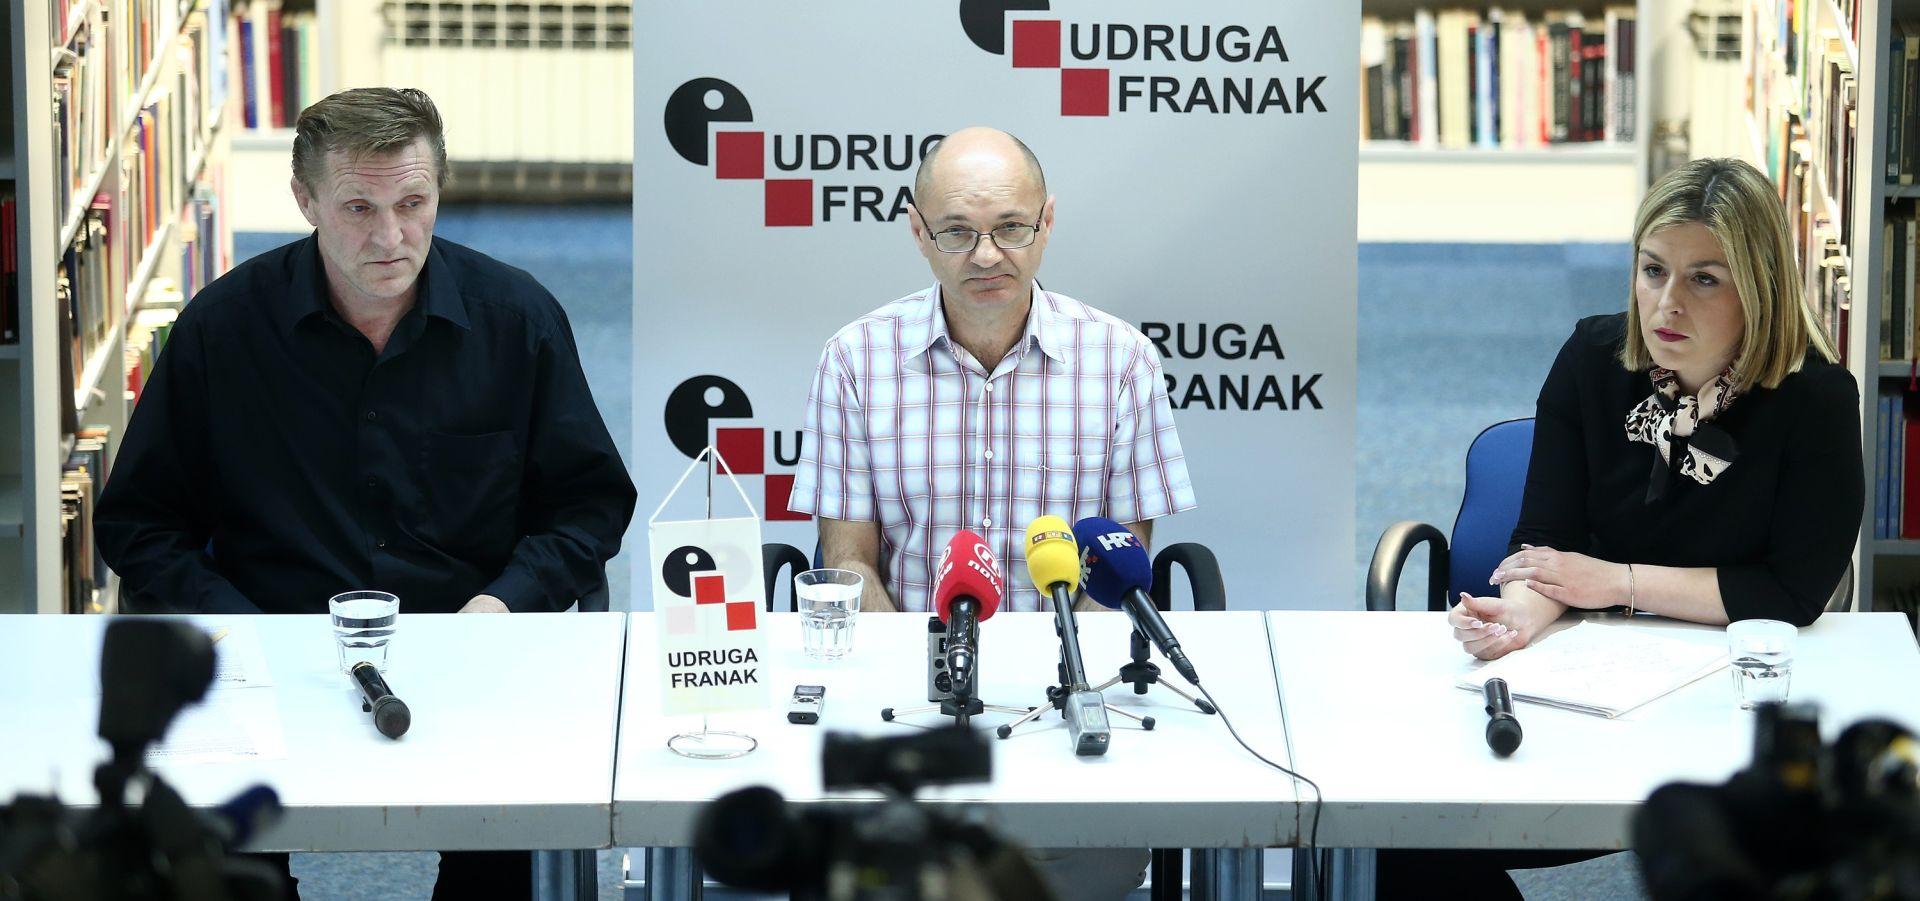 Udruga Franak: Nedodirljivi HNB staviti pod nadzor